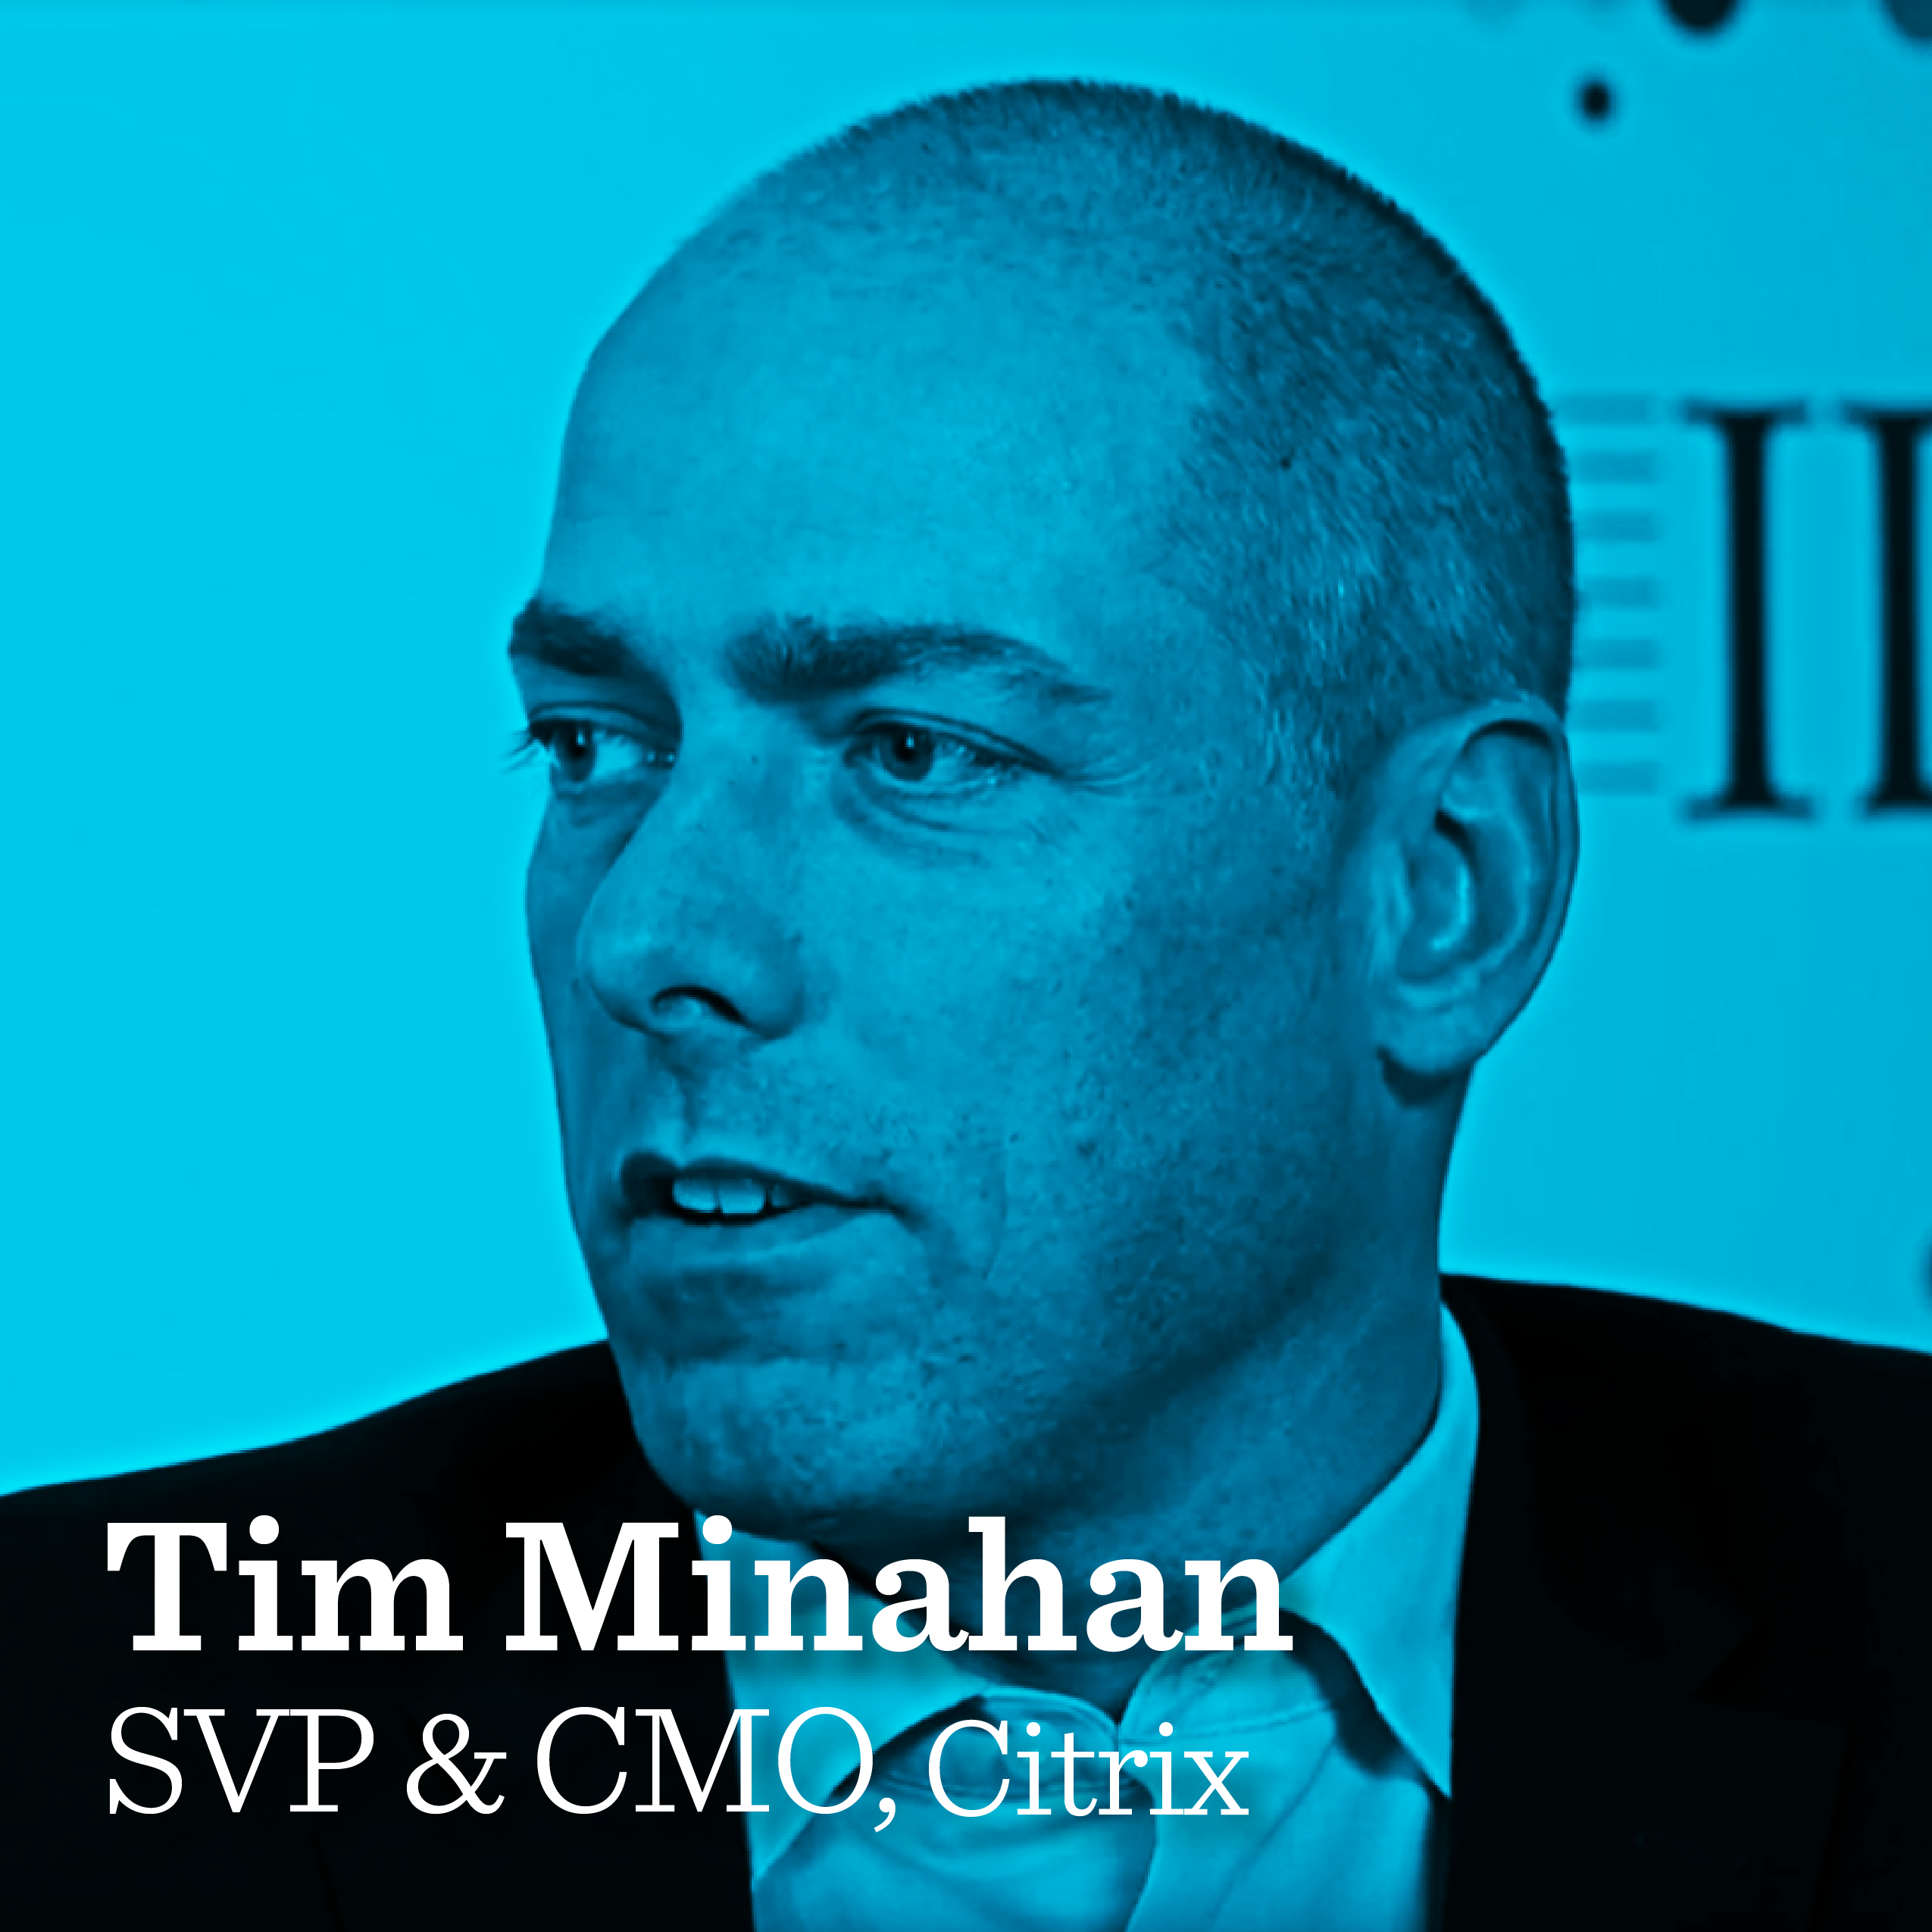 CMO-Citrix.png